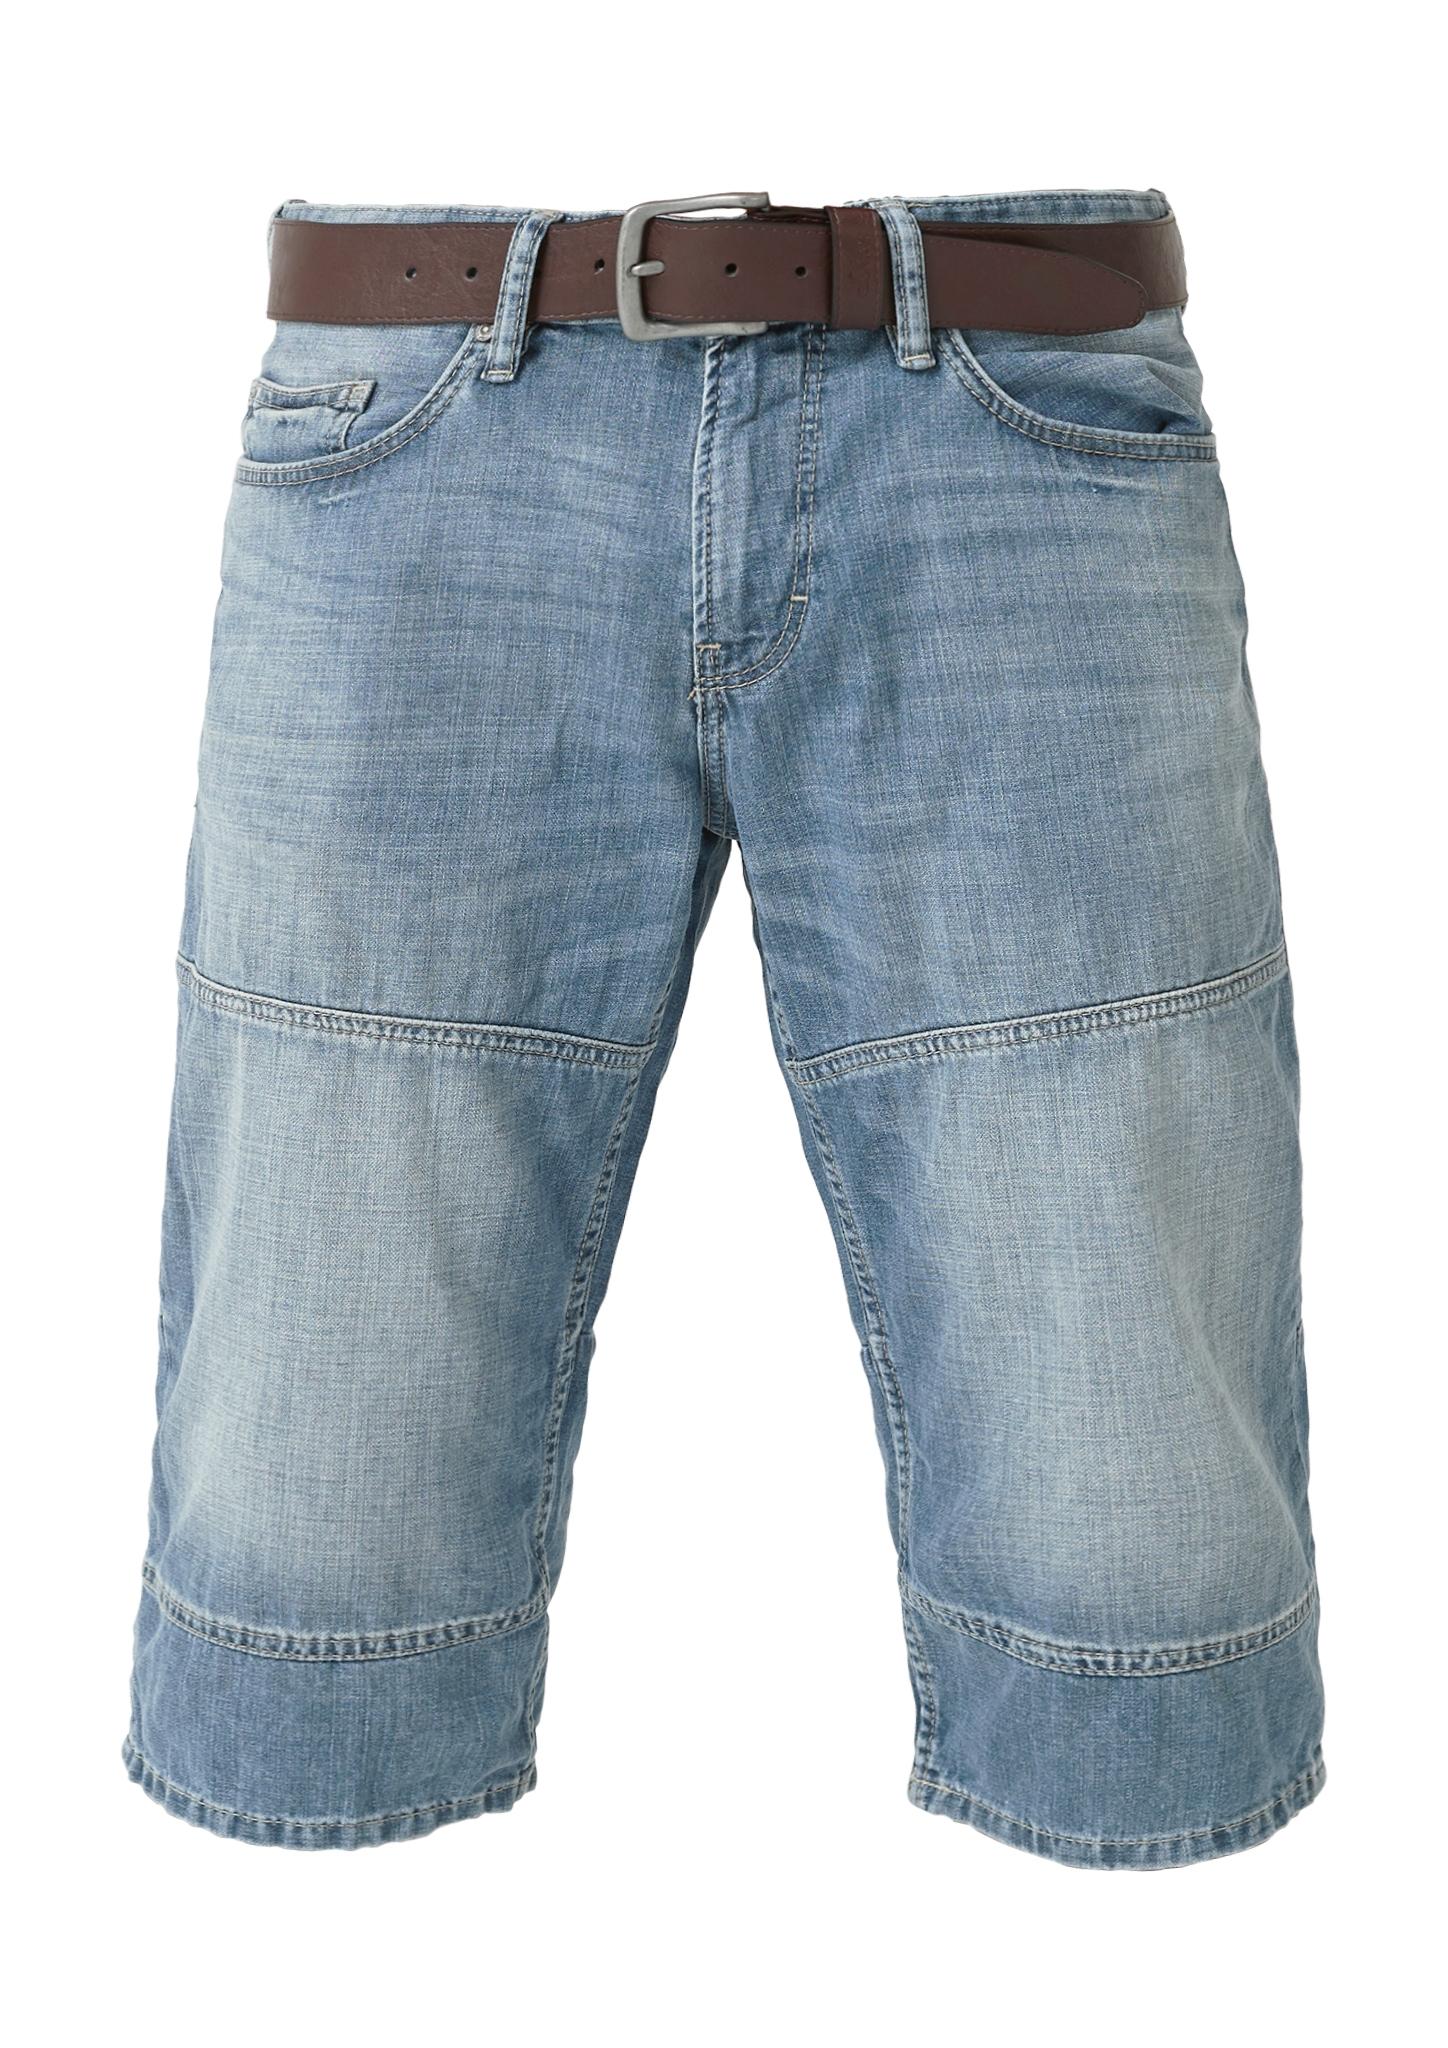 Jeansbermuda | Bekleidung > Shorts & Bermudas > Jeans Bermudas | s.Oliver